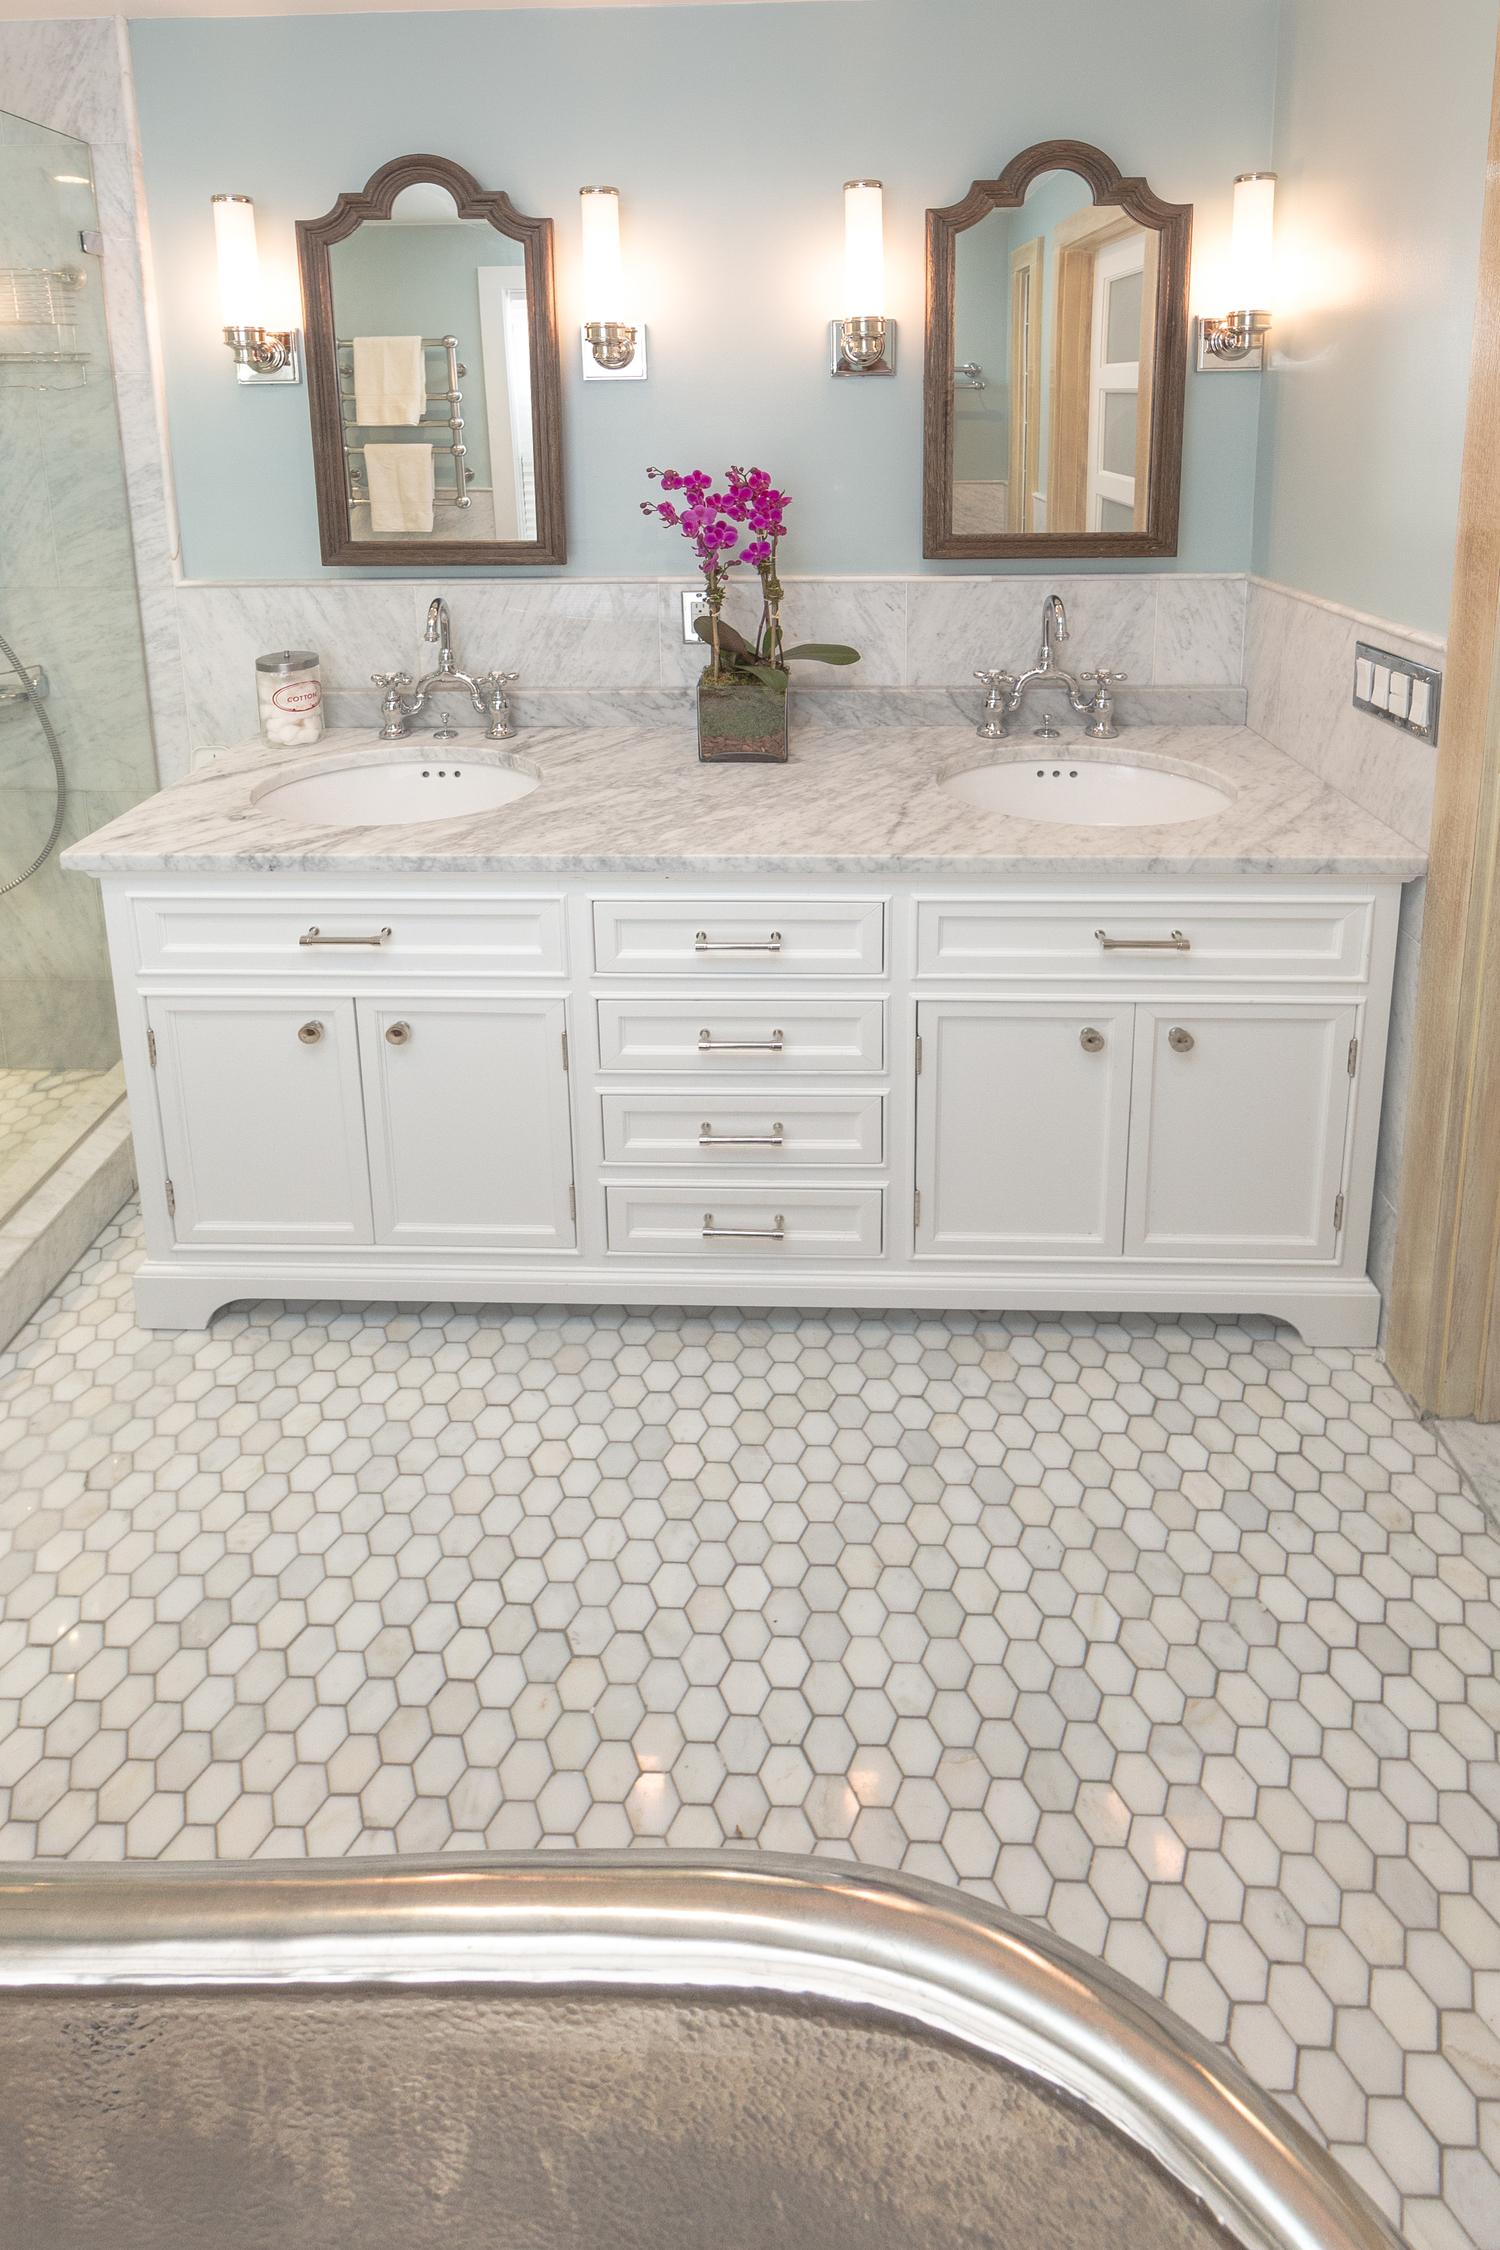 BROWNSTONE CLASSIC BATHROOM | MARIE BURGOS DESIGN